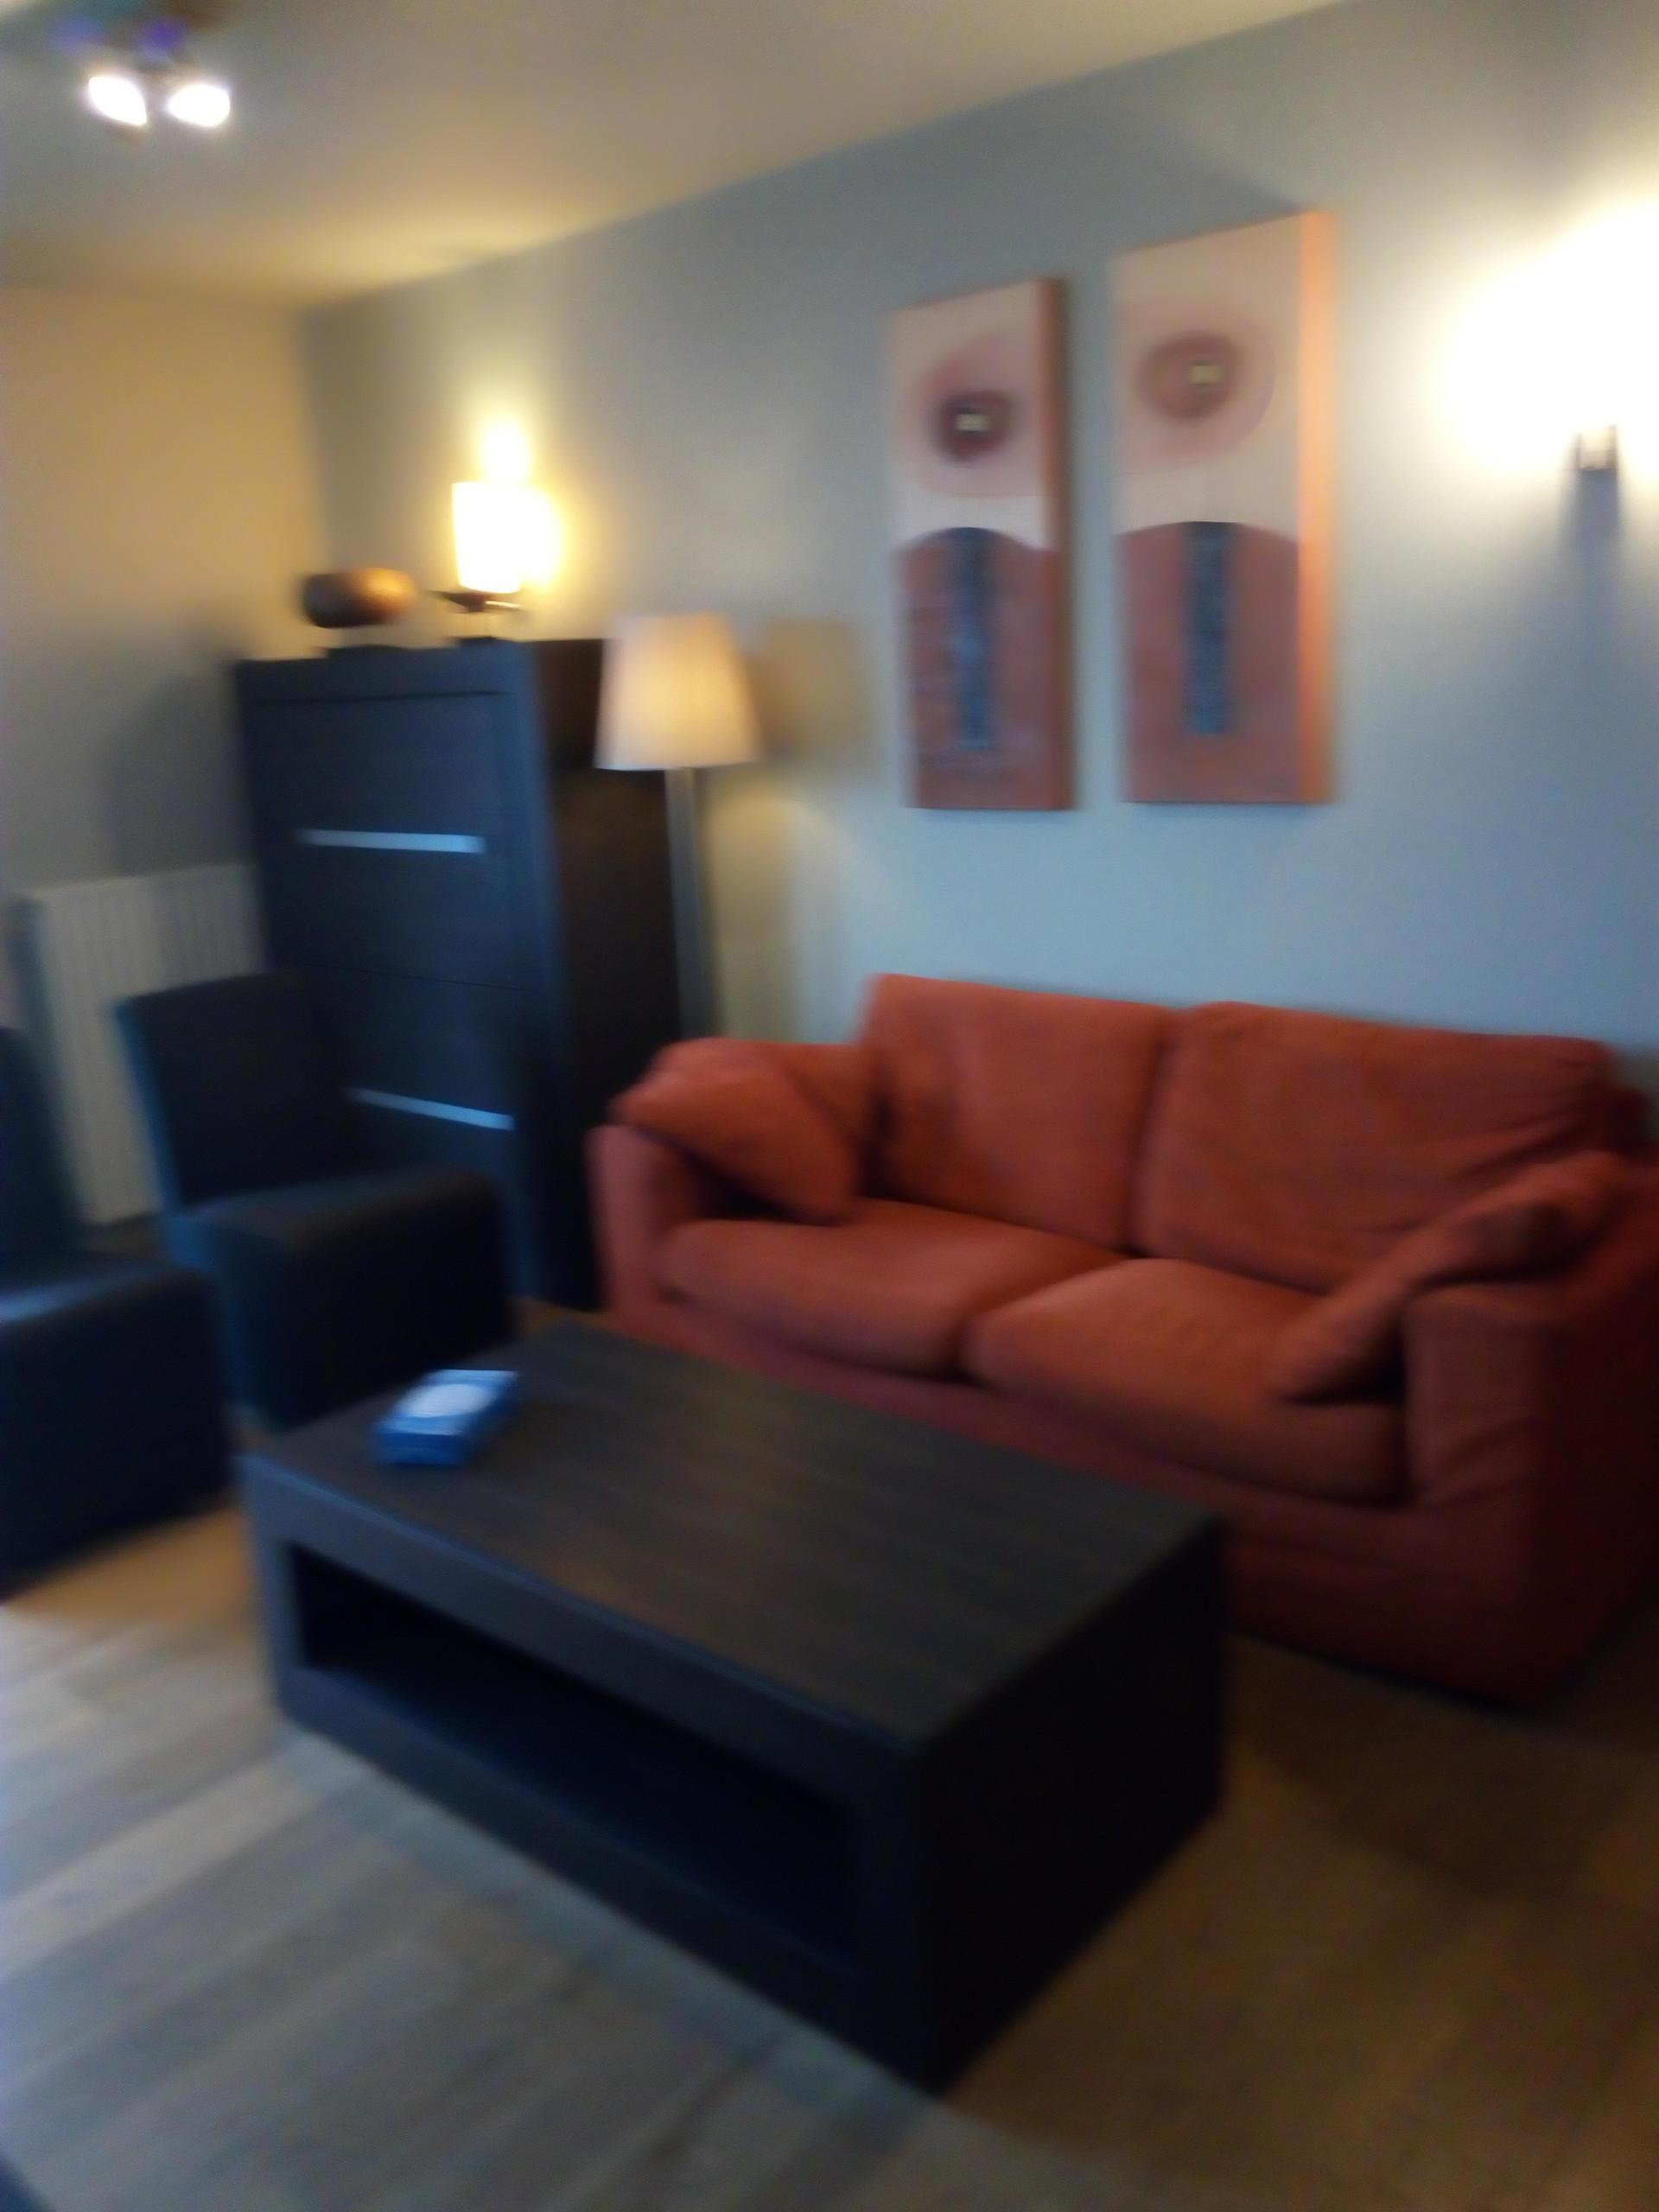 comfy-2-bedrooms-ensuite-ucleydiegem-9c407bbbf6689df6234393ee2582410c